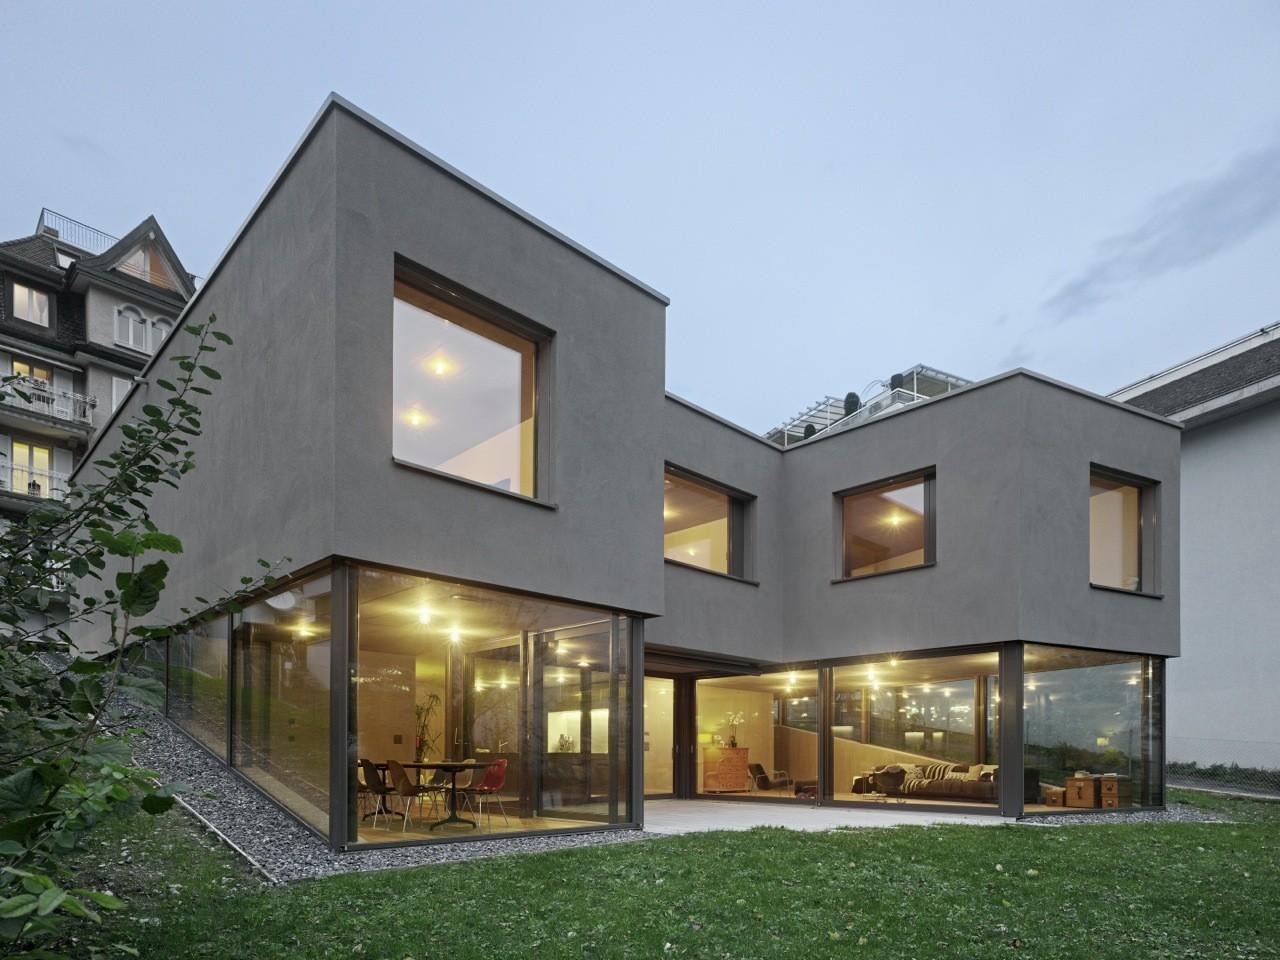 Casa no rio reuss dolmus architects archdaily brasil - Casas estrechas y largas ...